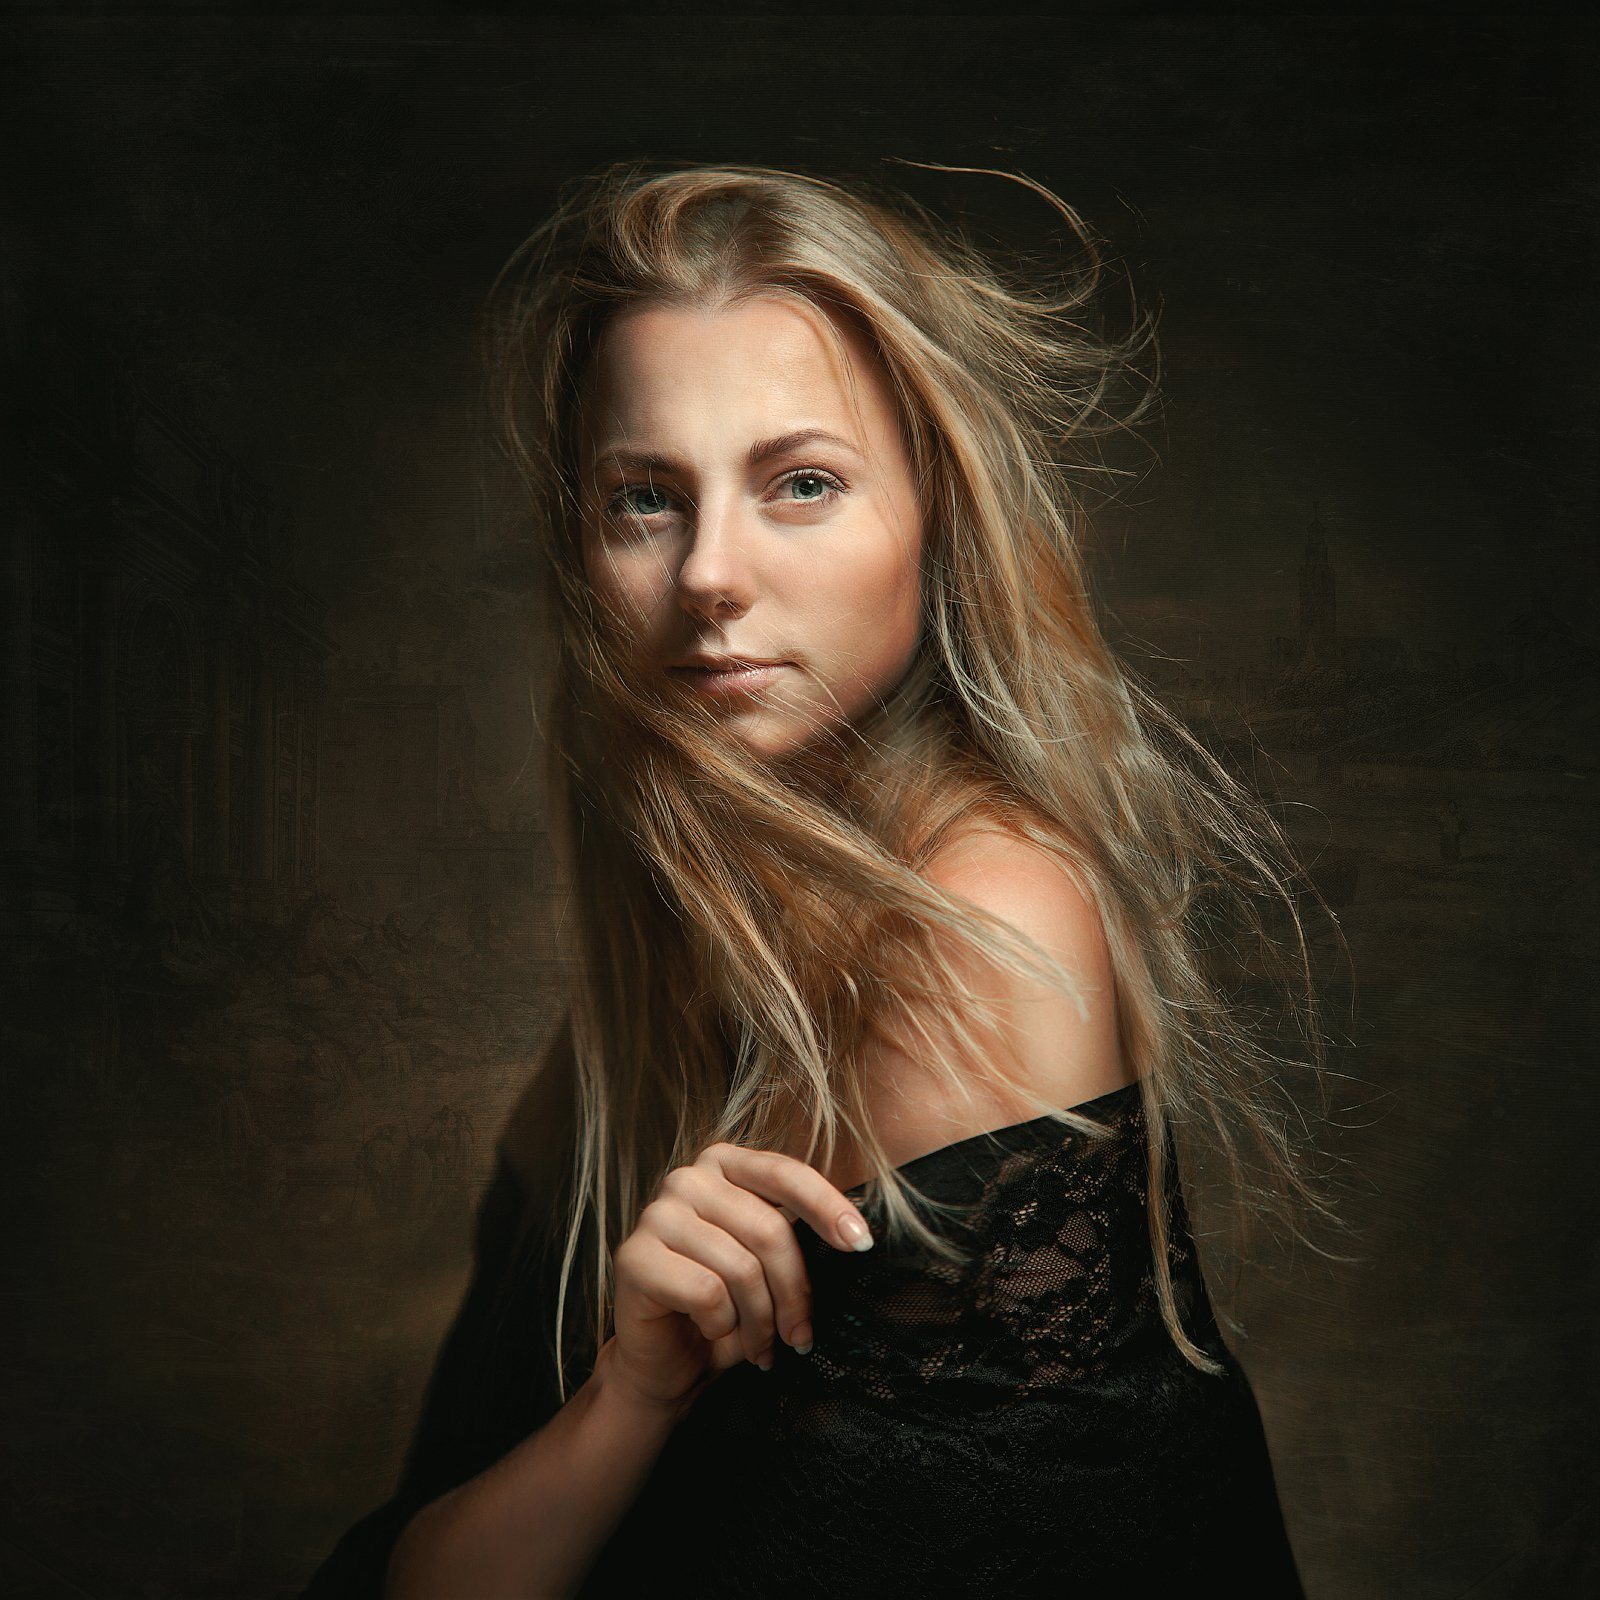 portrait, photo, greatfoto, dinamic, 35photo, woman, gorl, minsk, canon, light, studio, Алексей